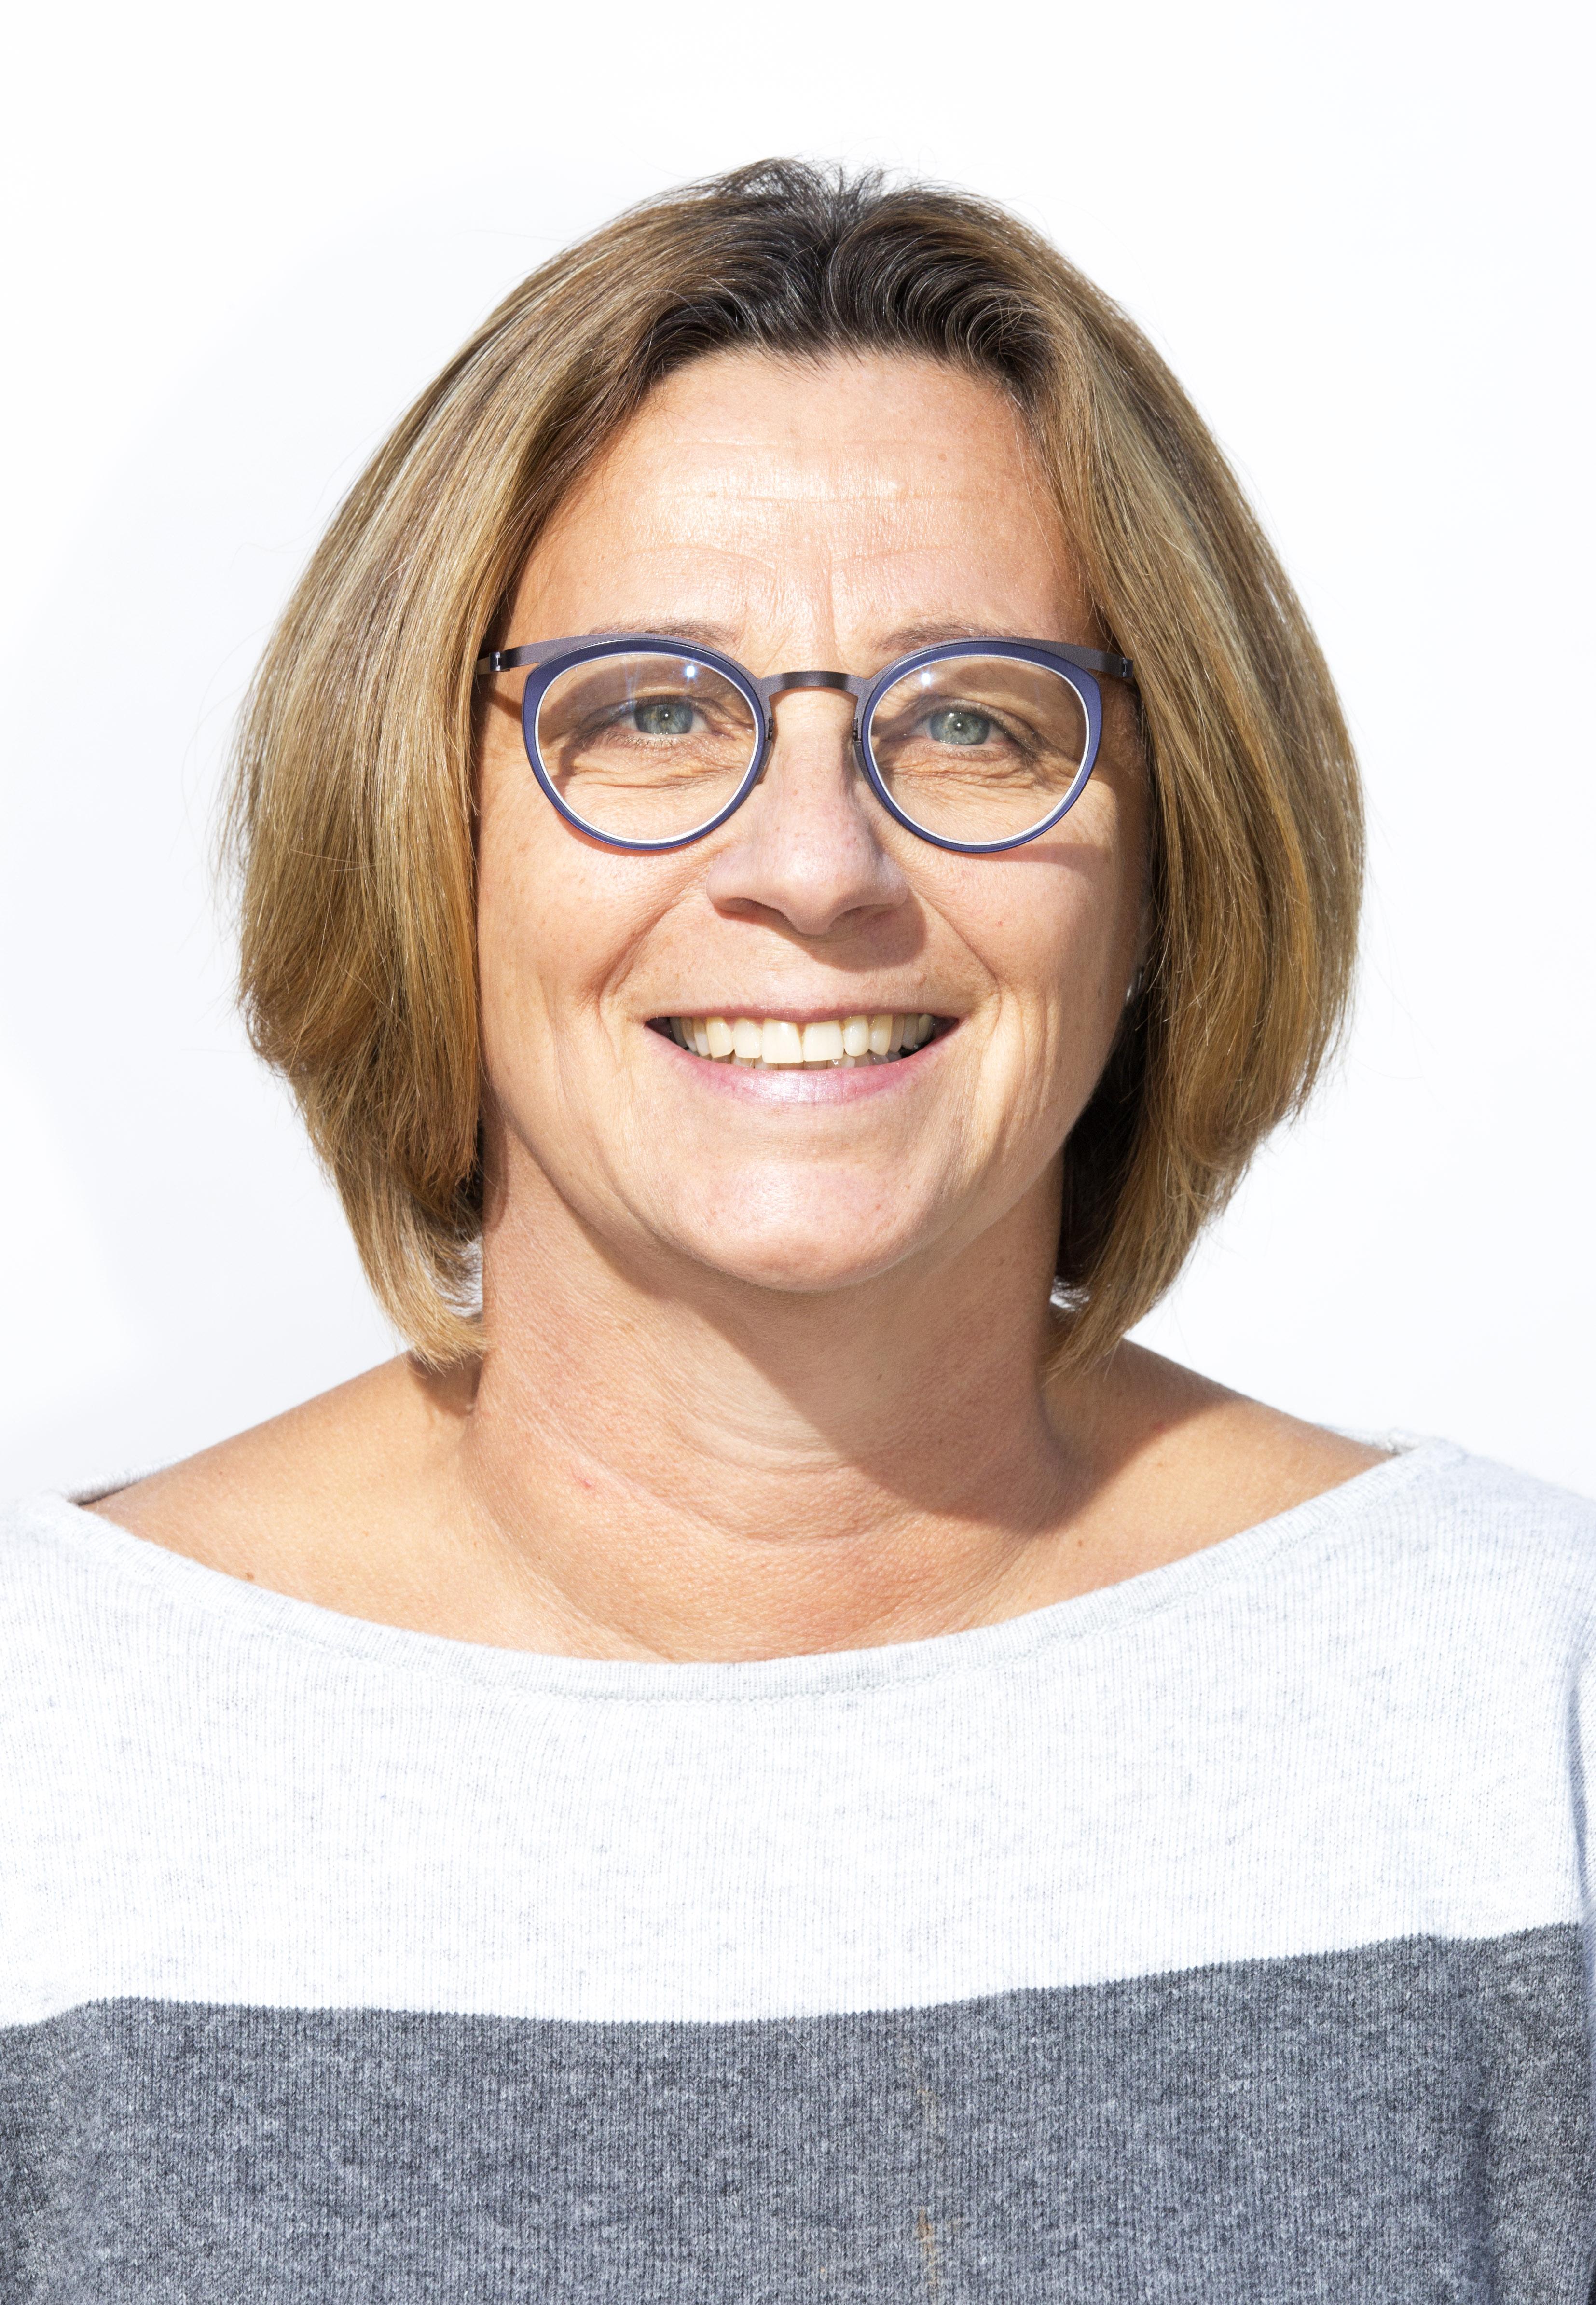 Bridgewater School's Headteacher Mrs Caren Doodson